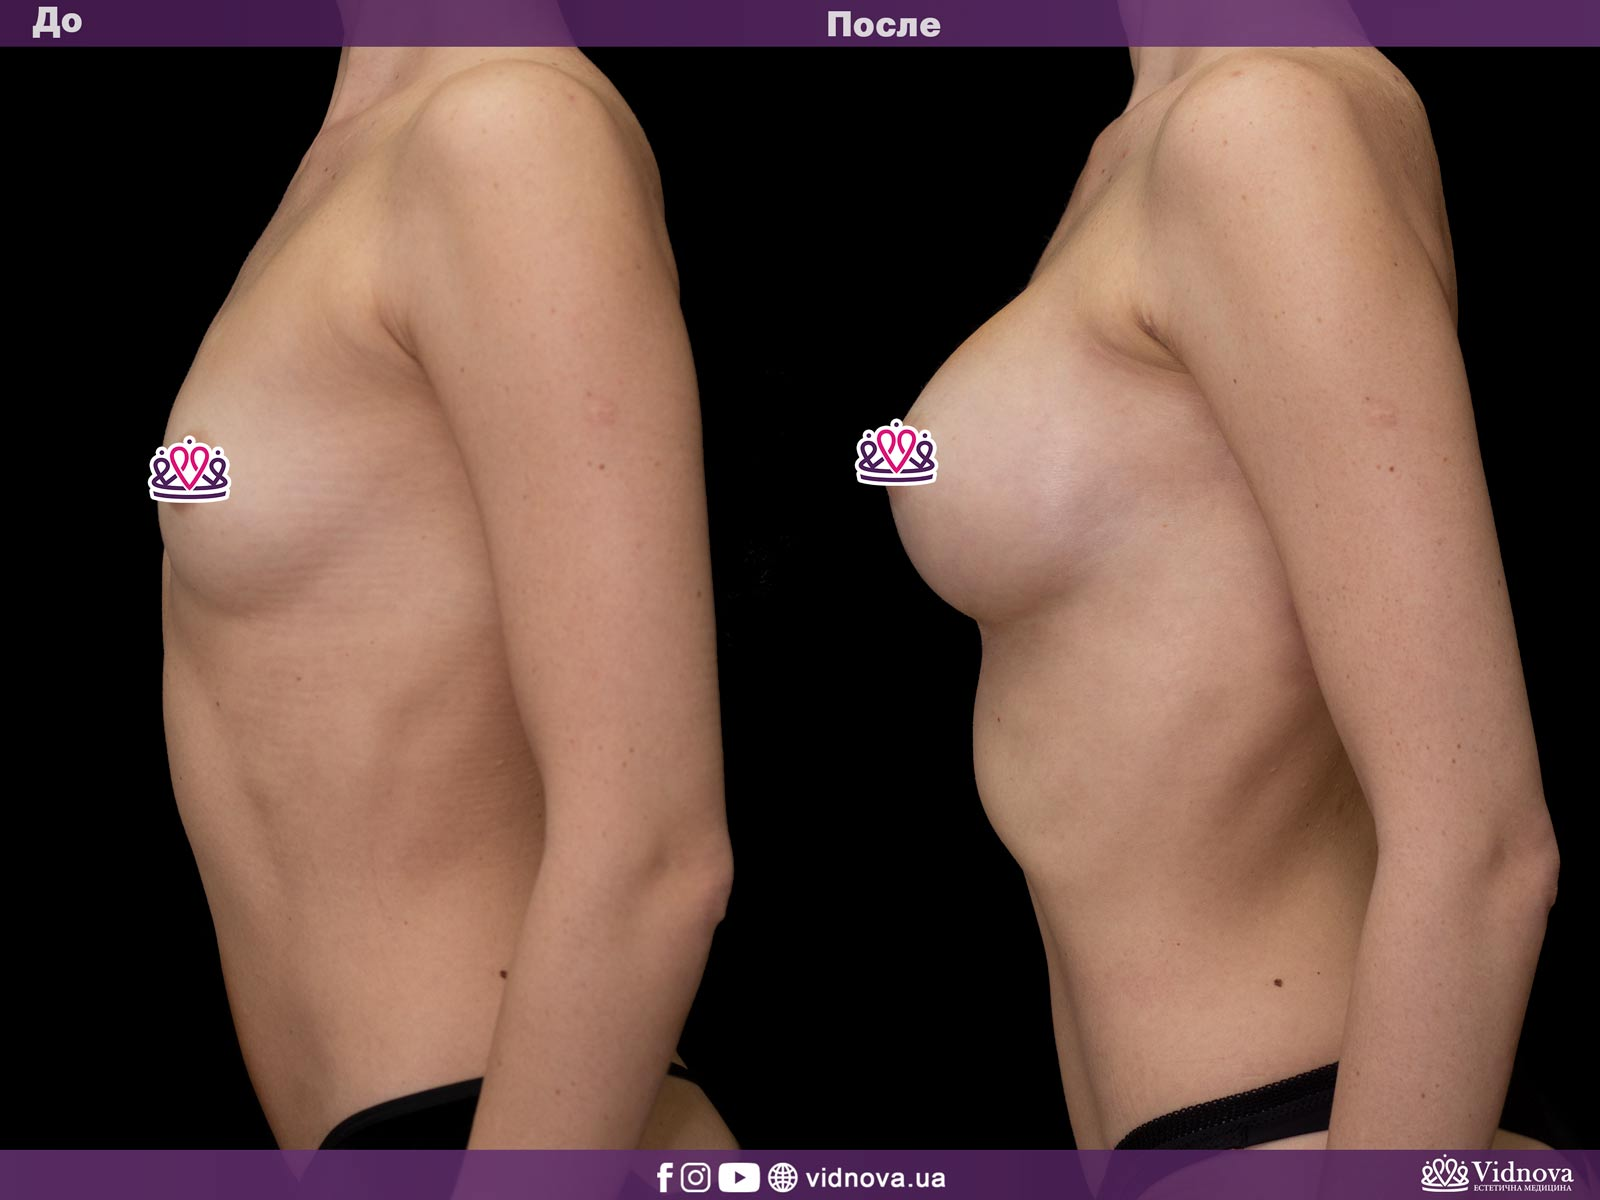 Увеличение груди: Фото ДО и ПОСЛЕ - Пример №28-3 - Клиника Vidnova